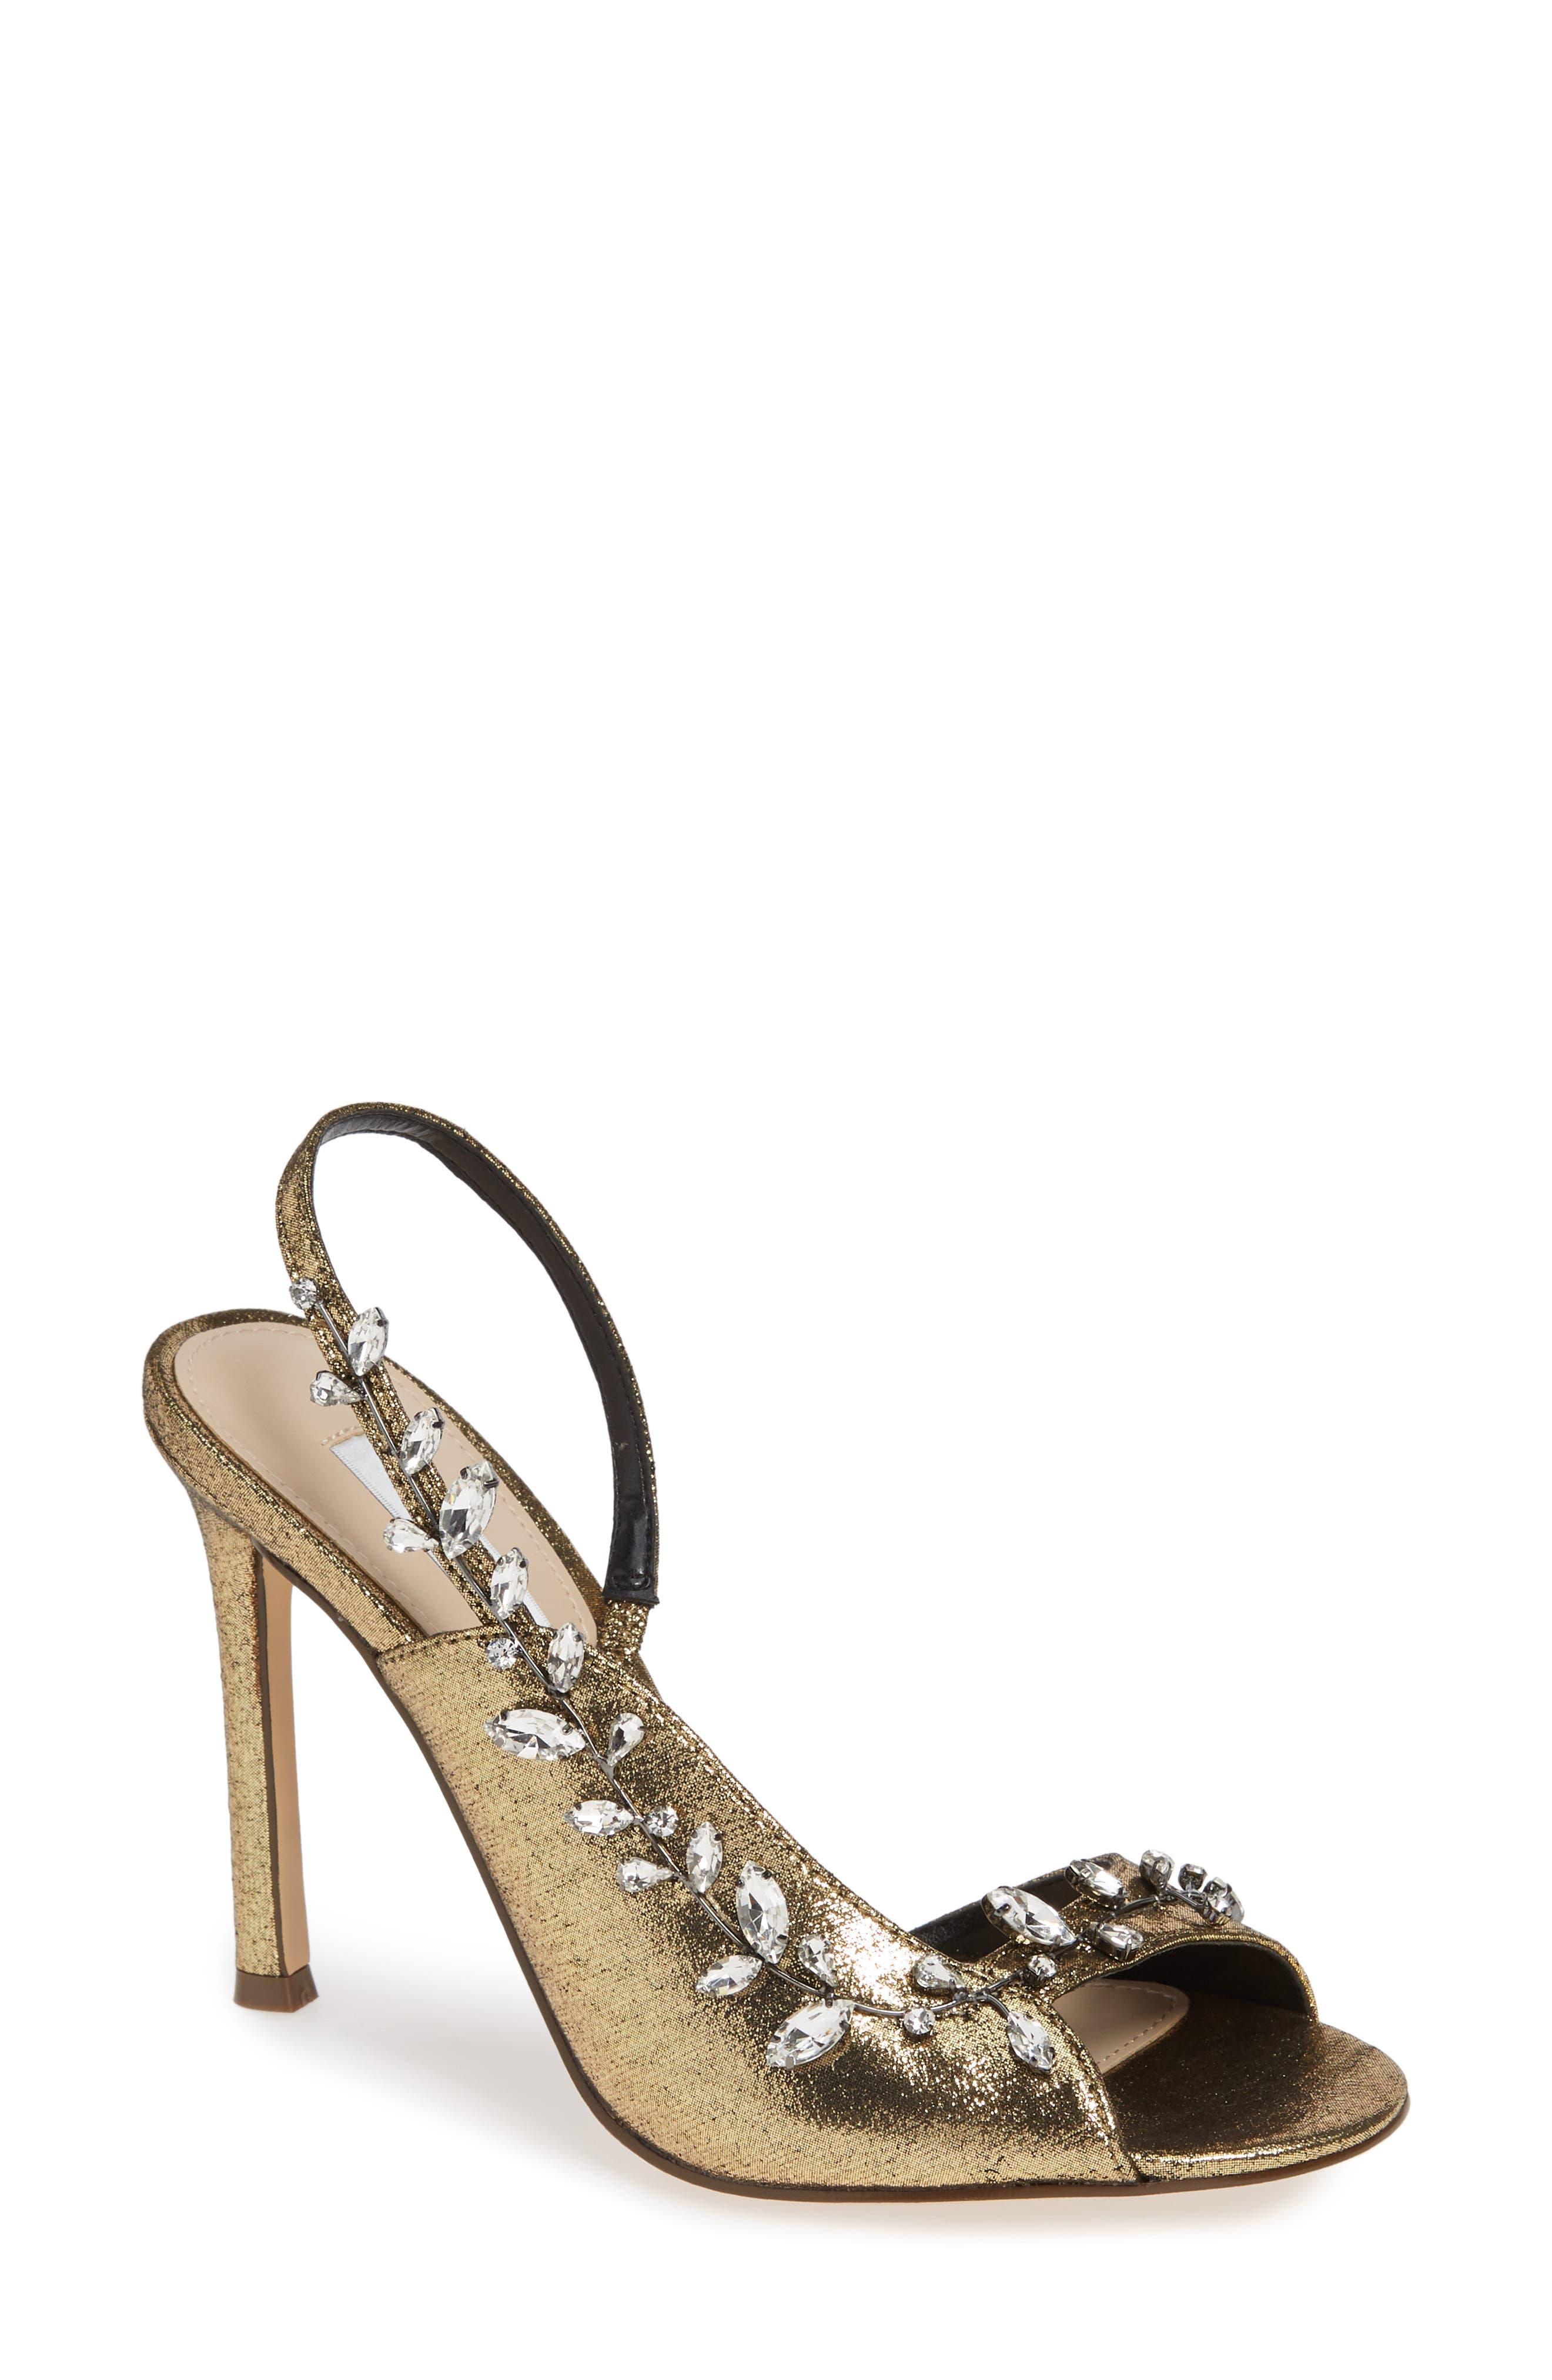 Nina Deanna Embellished Sandal, Metallic